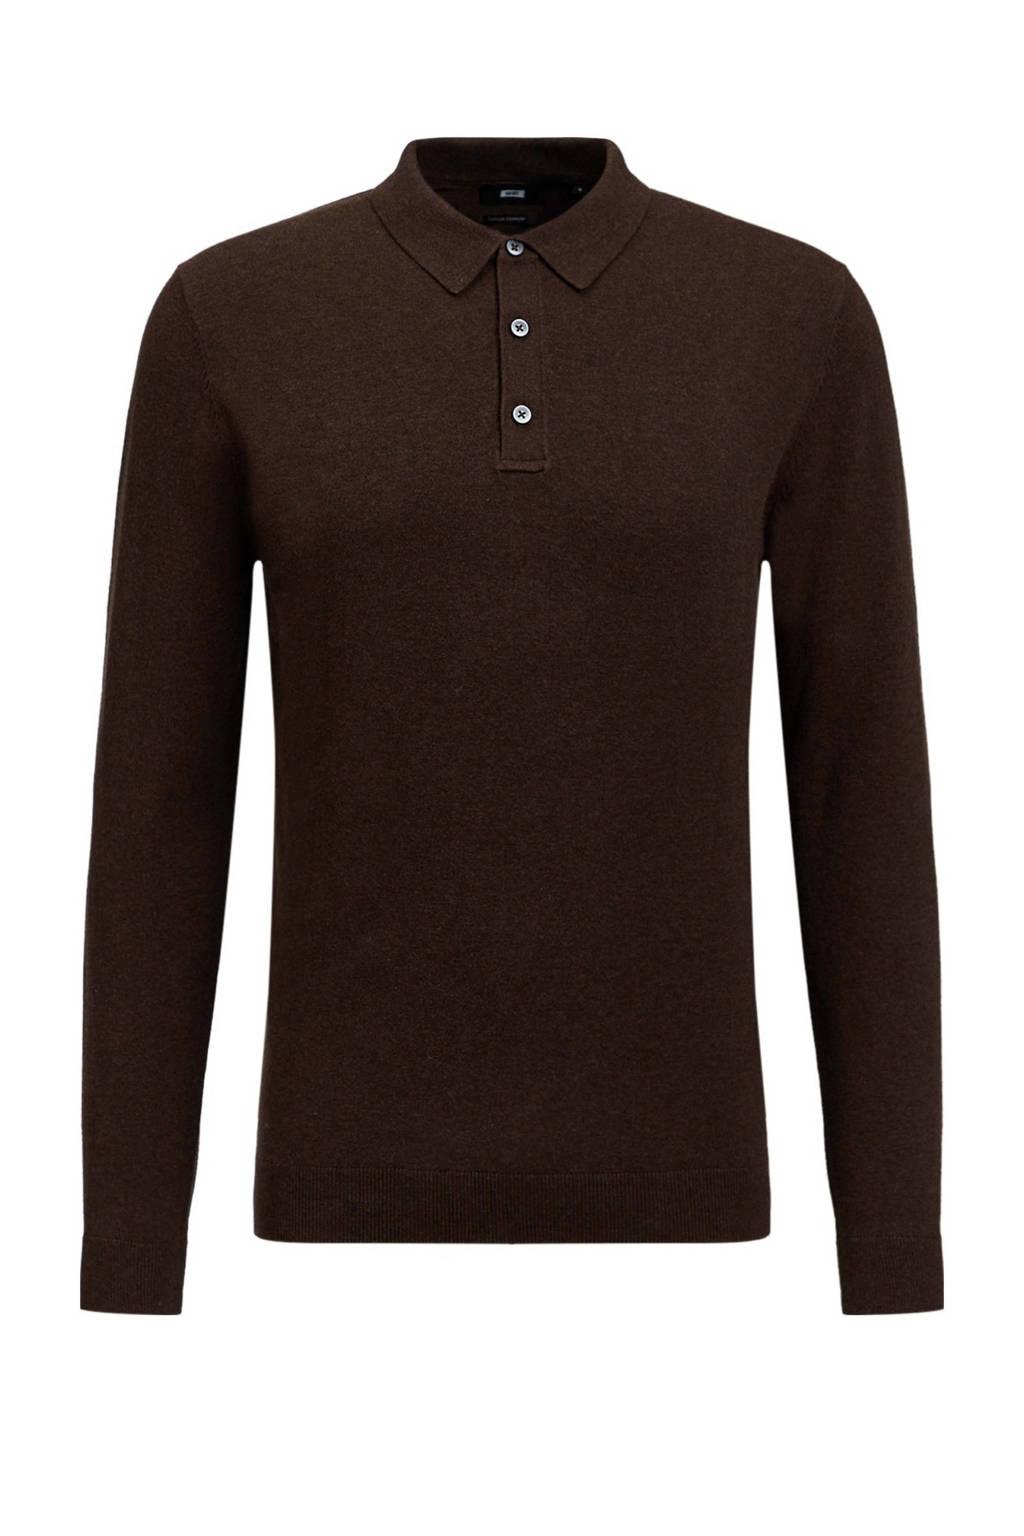 WE Fashion Fundamentals fijngebreide slim fit polo bruin, Bruin